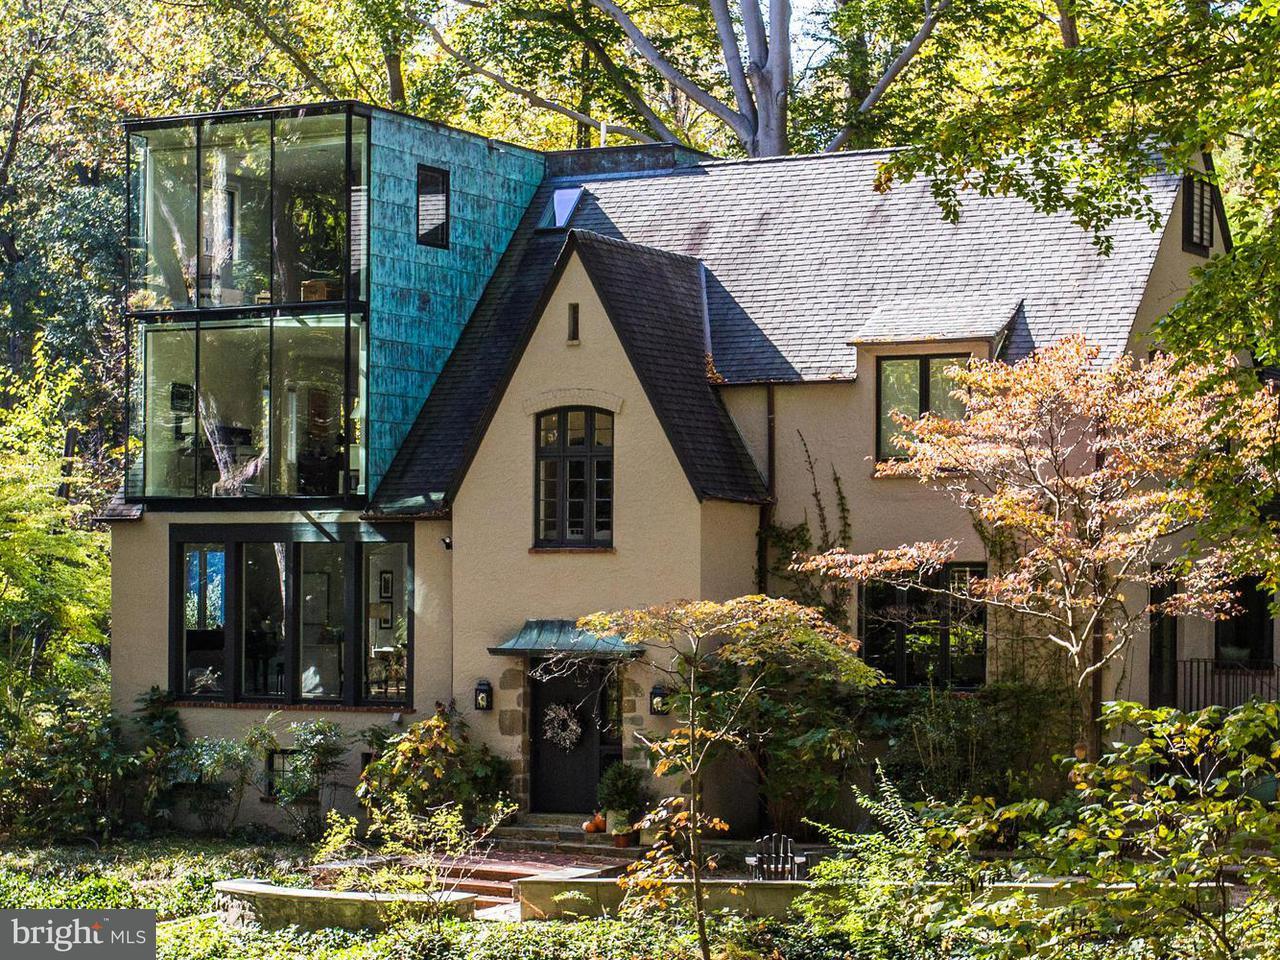 Single Family Home for Sale at 2871 AUDUBON TER NW 2871 AUDUBON TER NW Washington, District Of Columbia 20008 United States